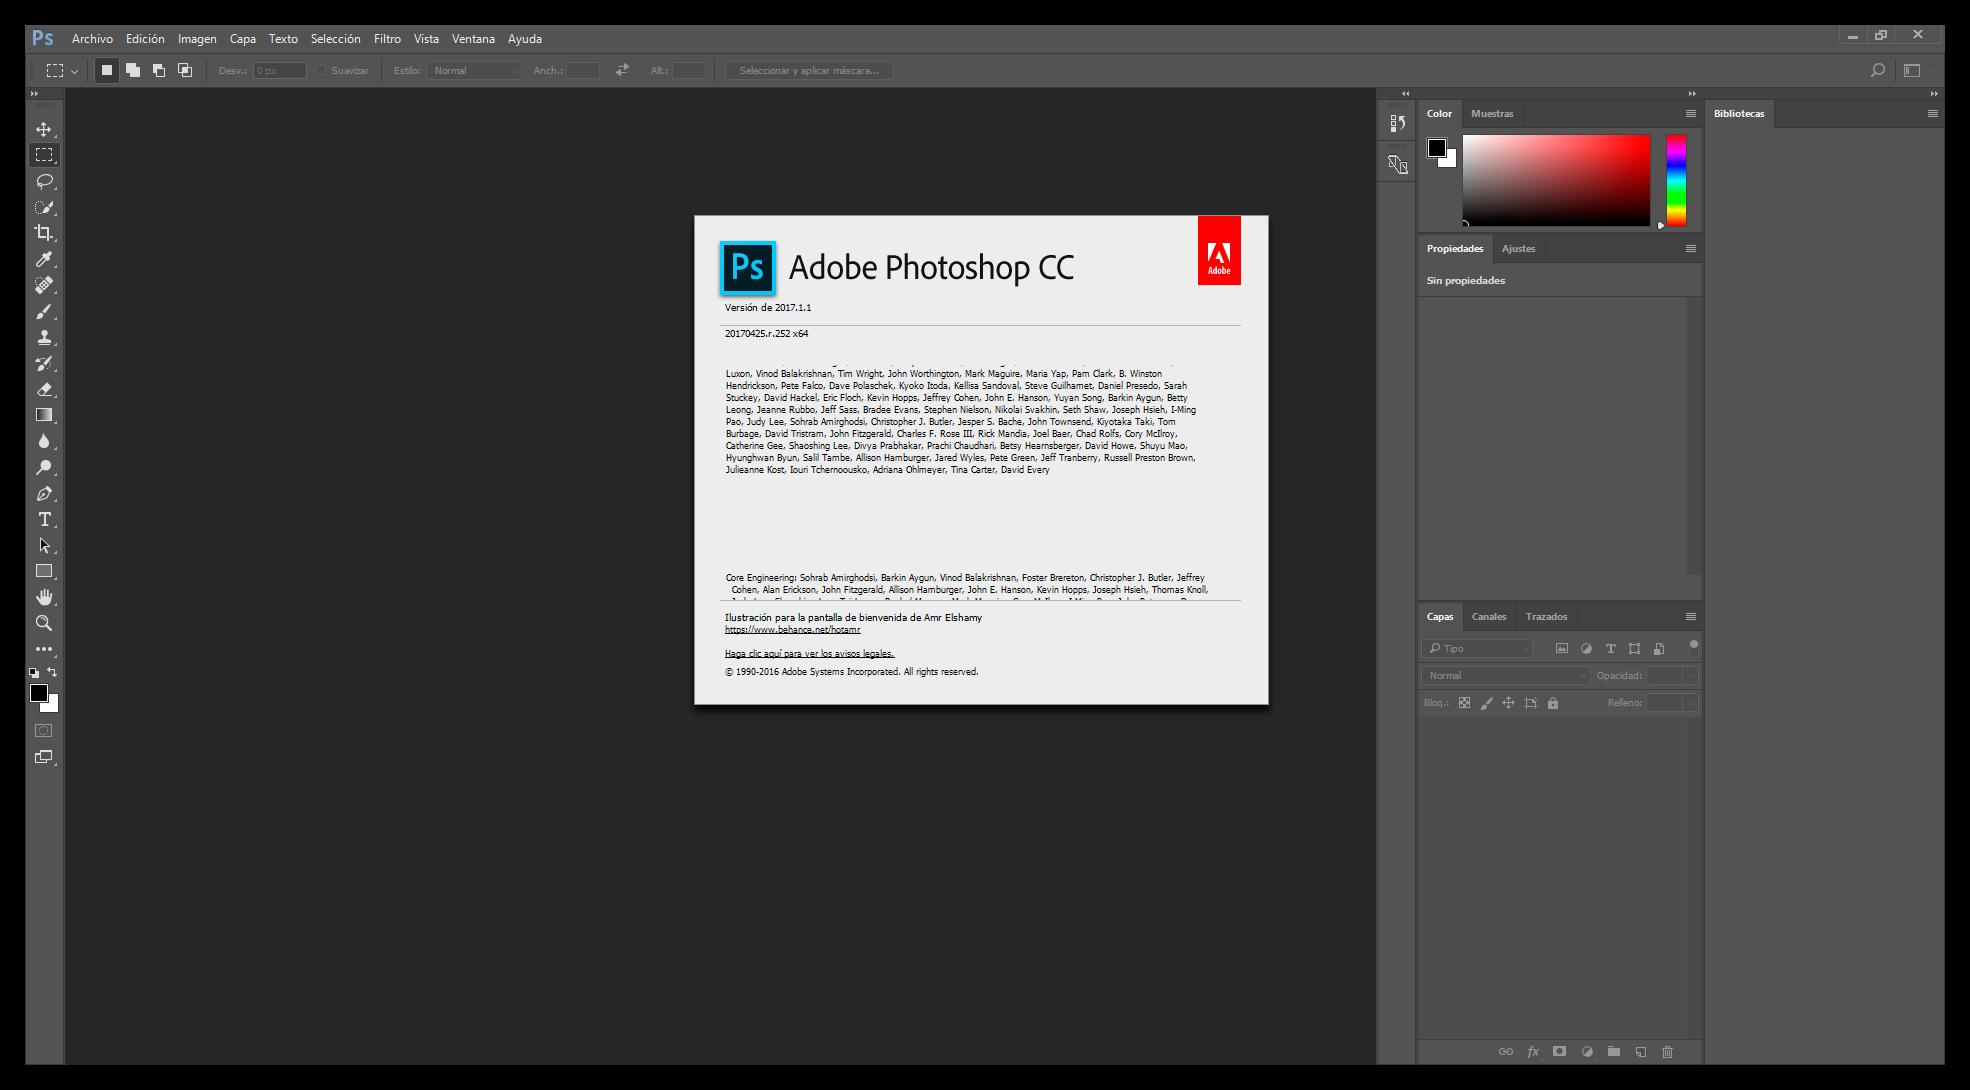 product key for adobe photoshop cc 2017